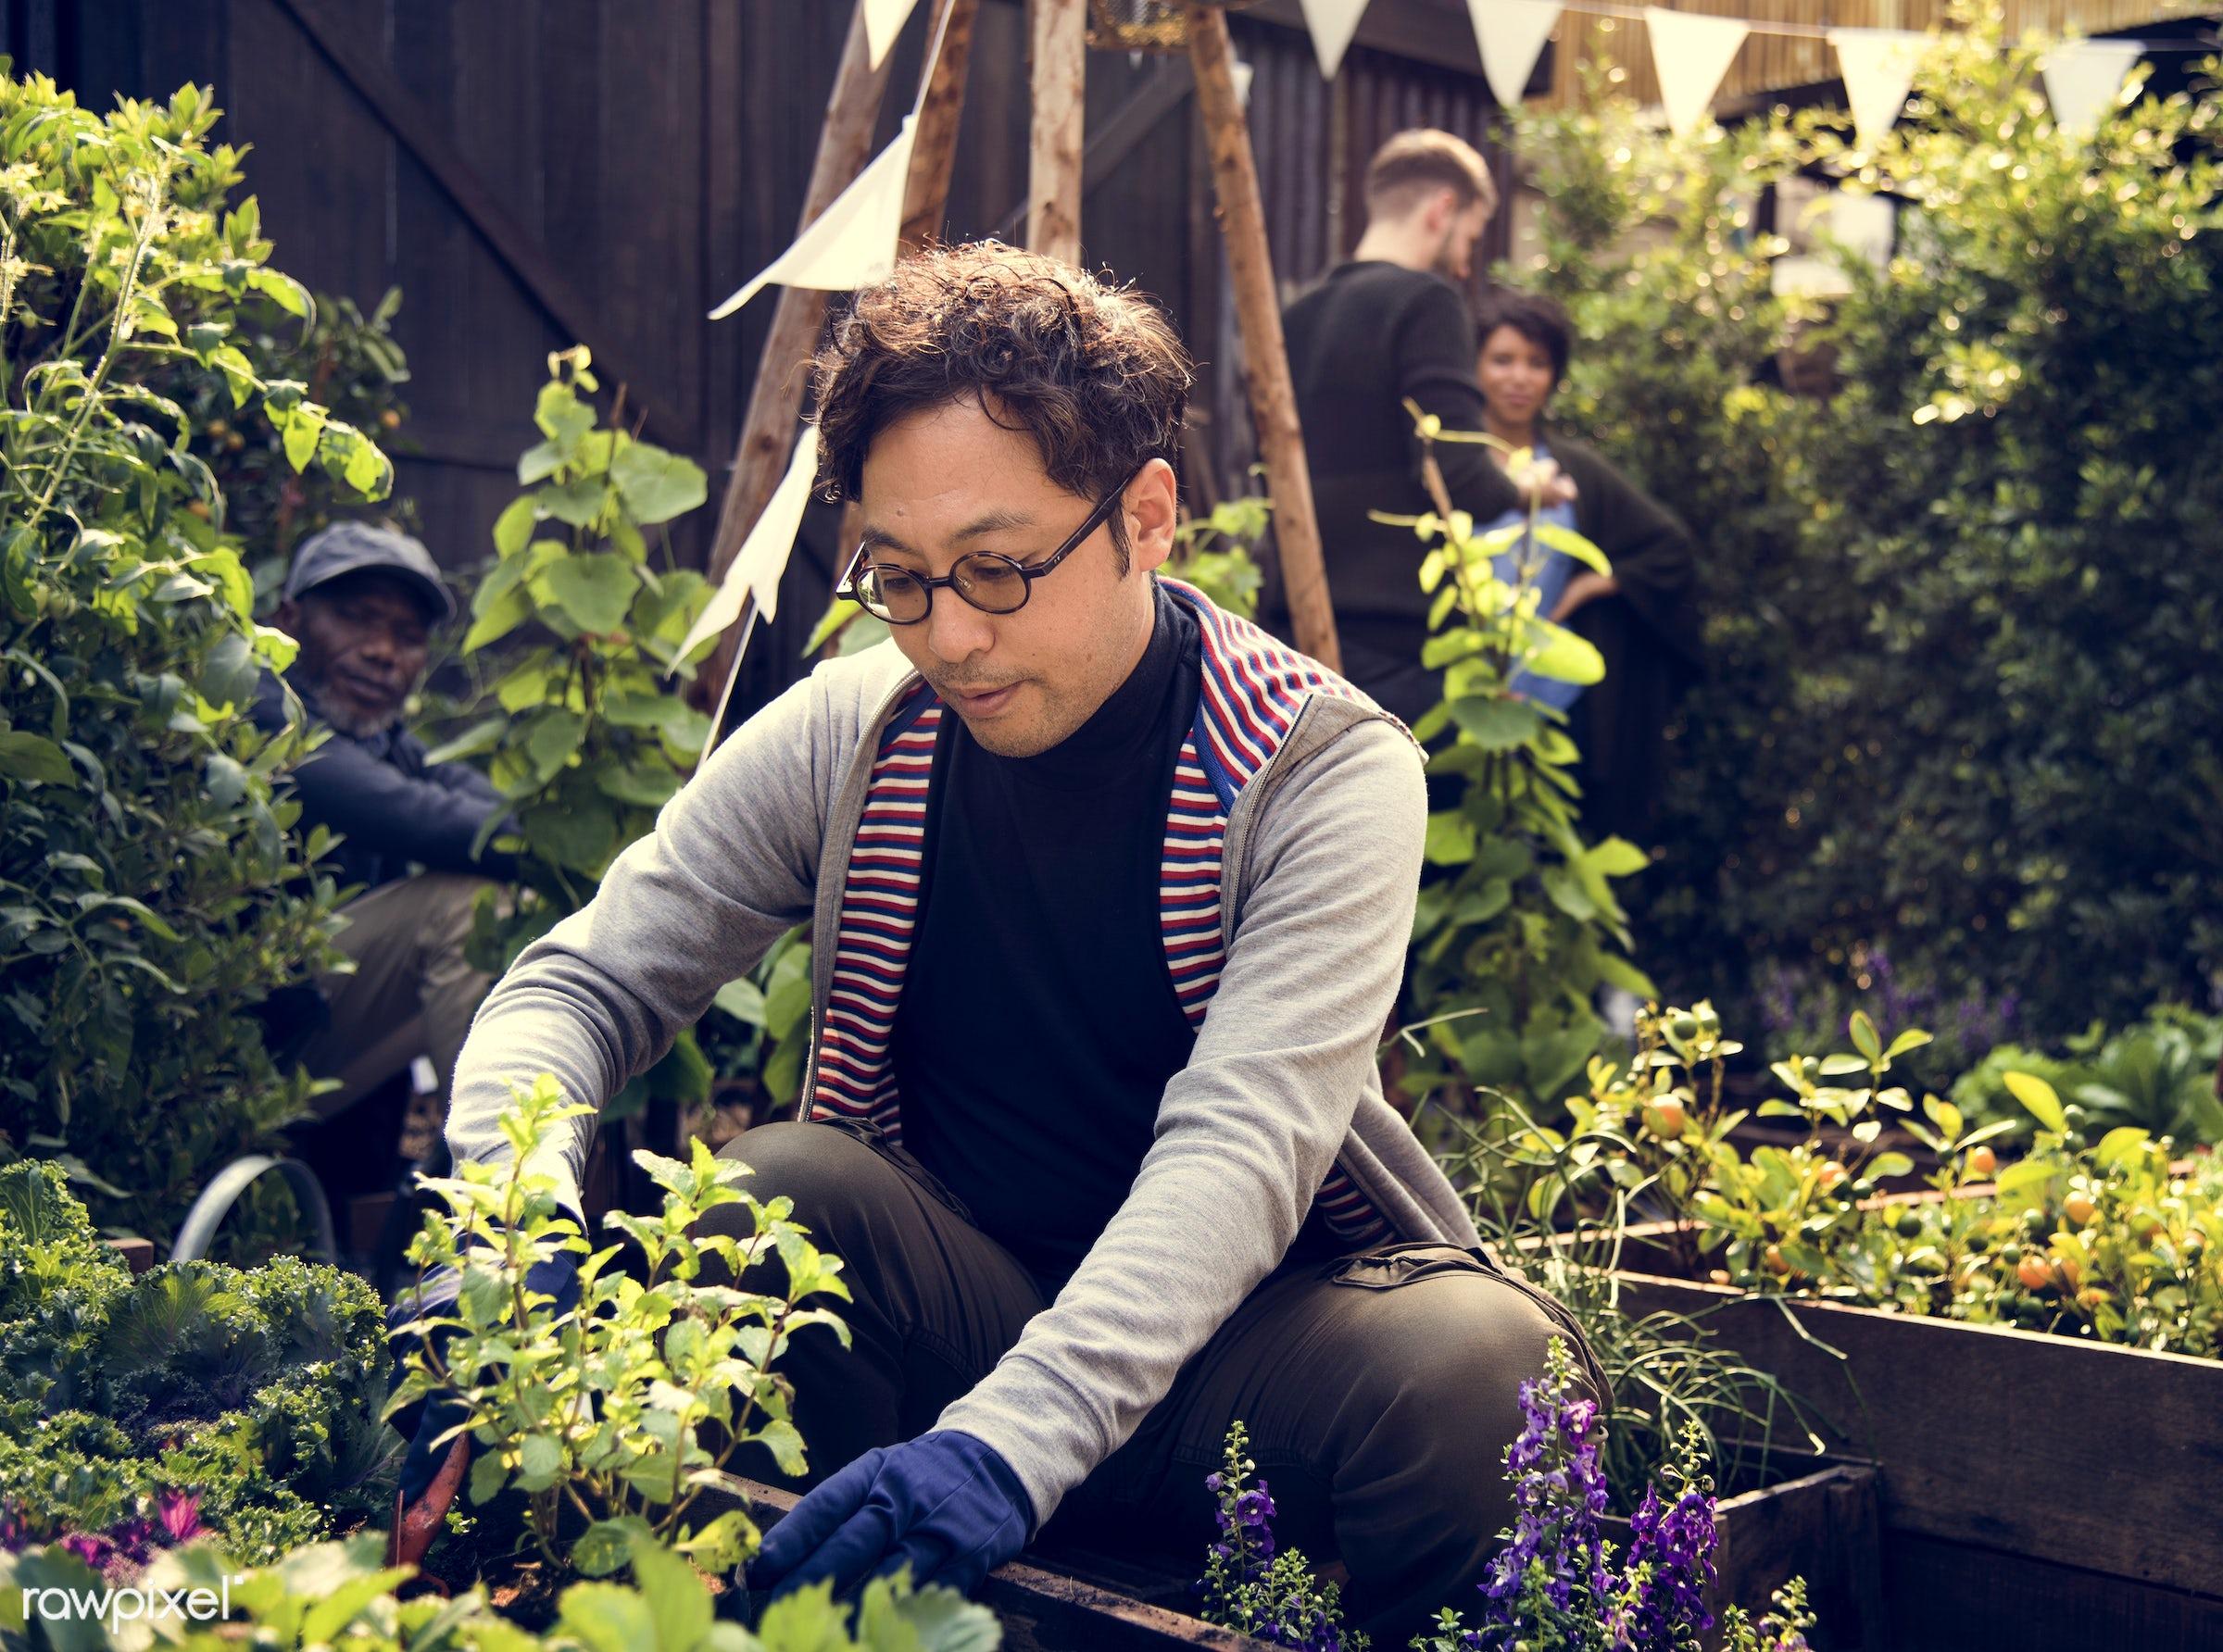 plant, nutritious, tomato, greenhouse, basil, asian ethnicity, friends, farmer, fresh, lettuce, healthy eating, friendship,...